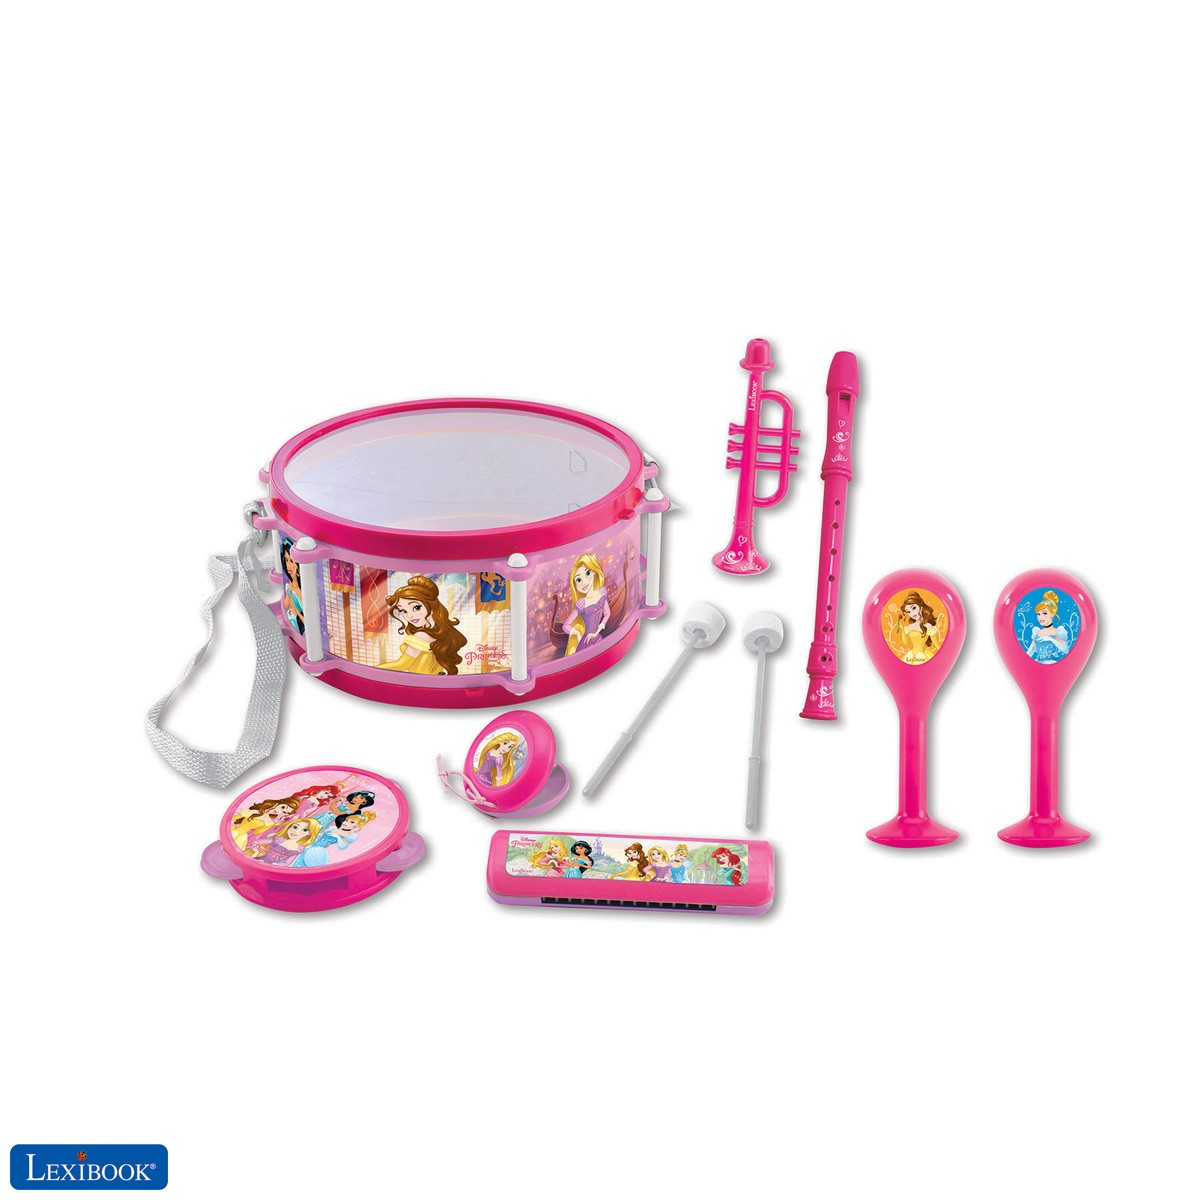 Disney Principessa Rapunzel Cenerentola  giocattolo musicale